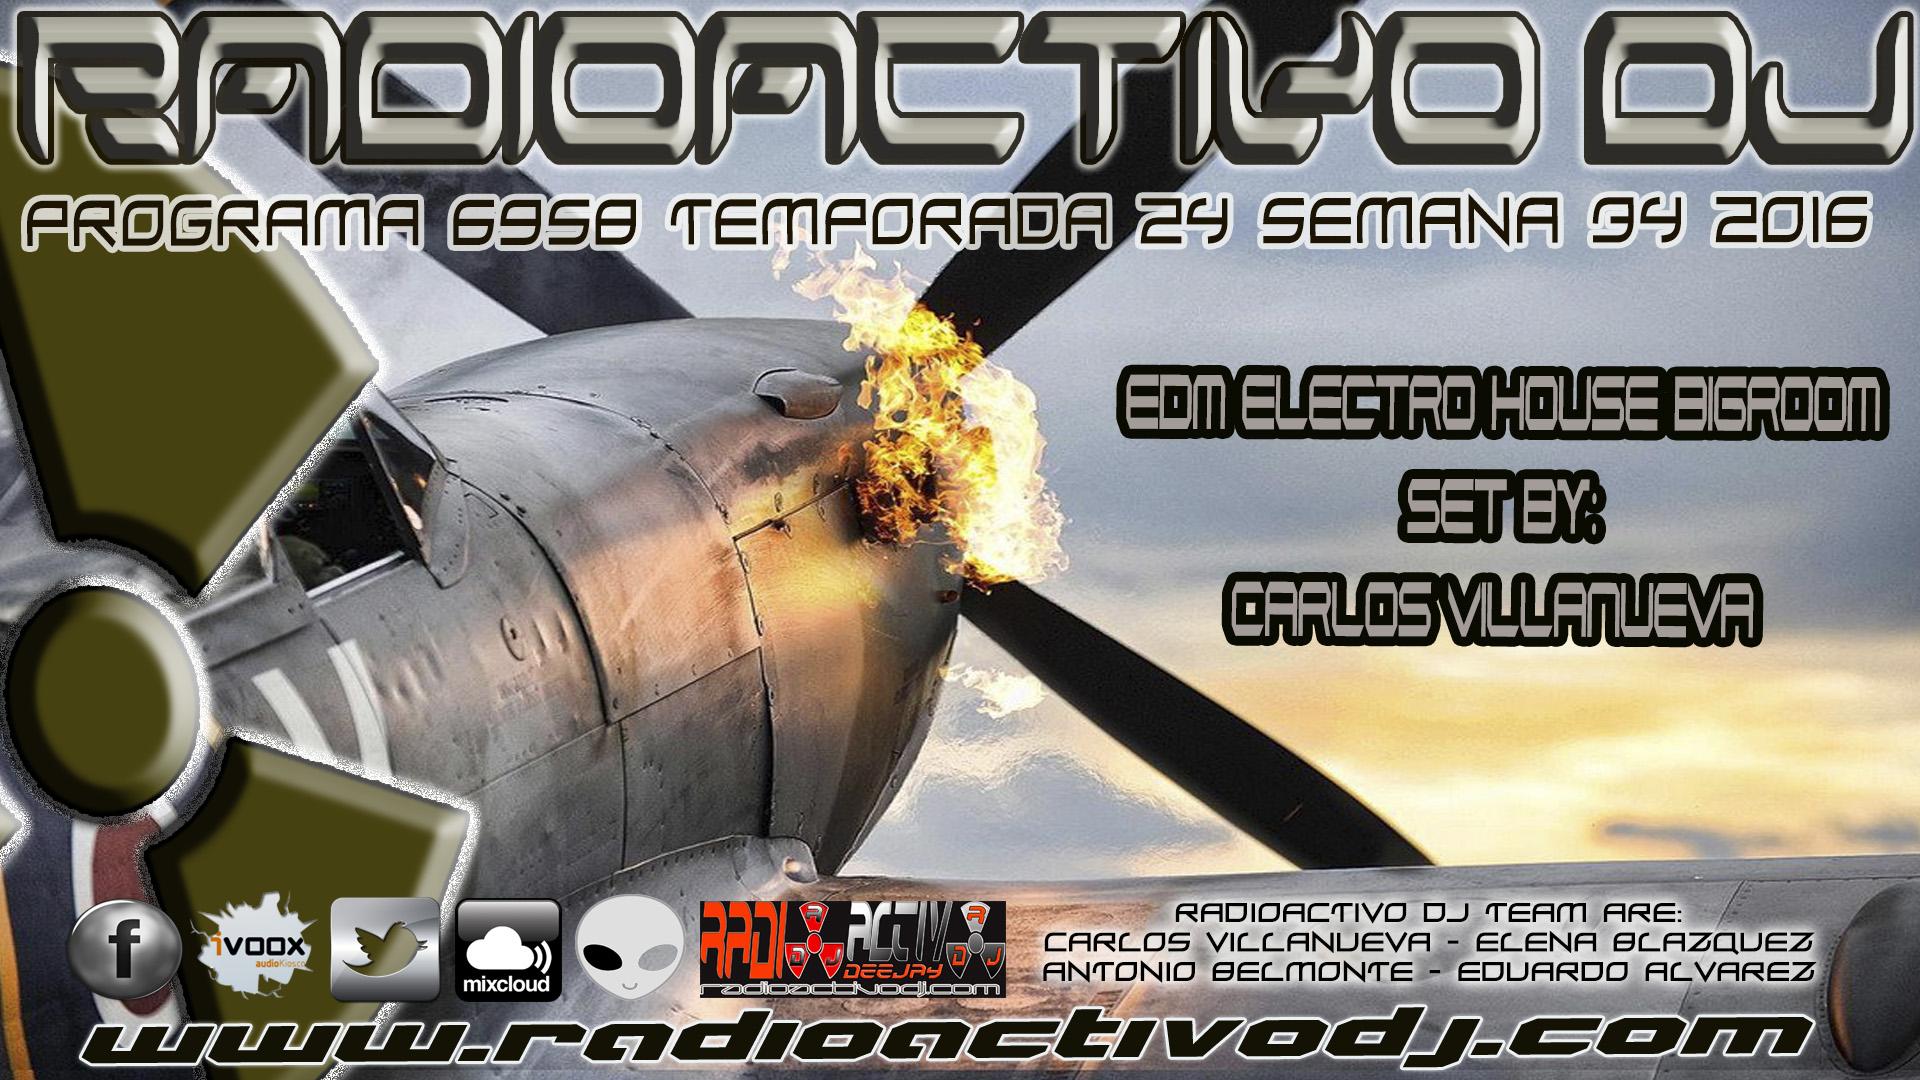 RADIOACTIVO-DJ-342016